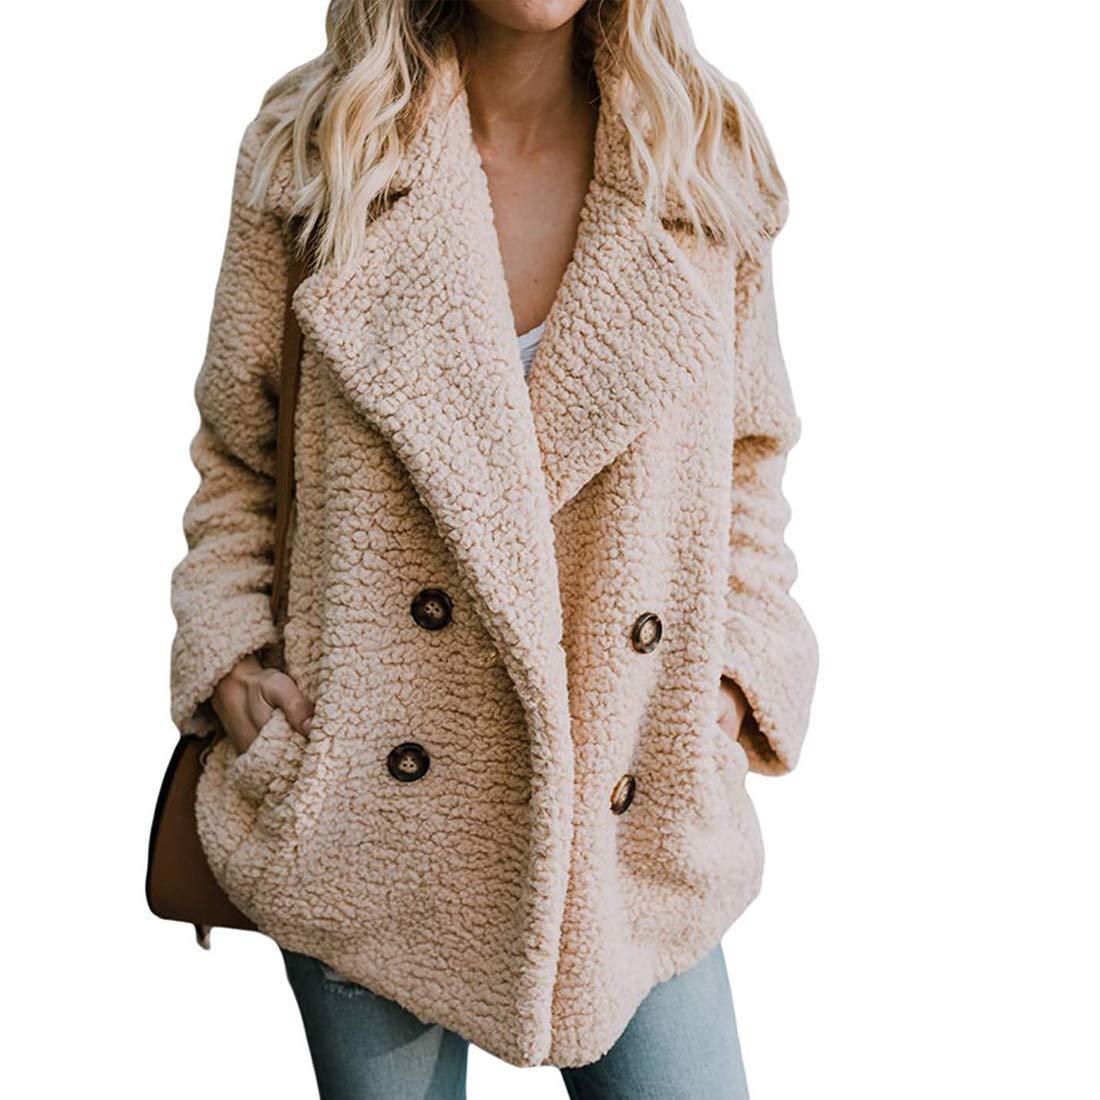 Khaki Bibowa Fuzzy Jacket Women Faux Shearling Soft Lightweight Warm Winter Coats Trendy